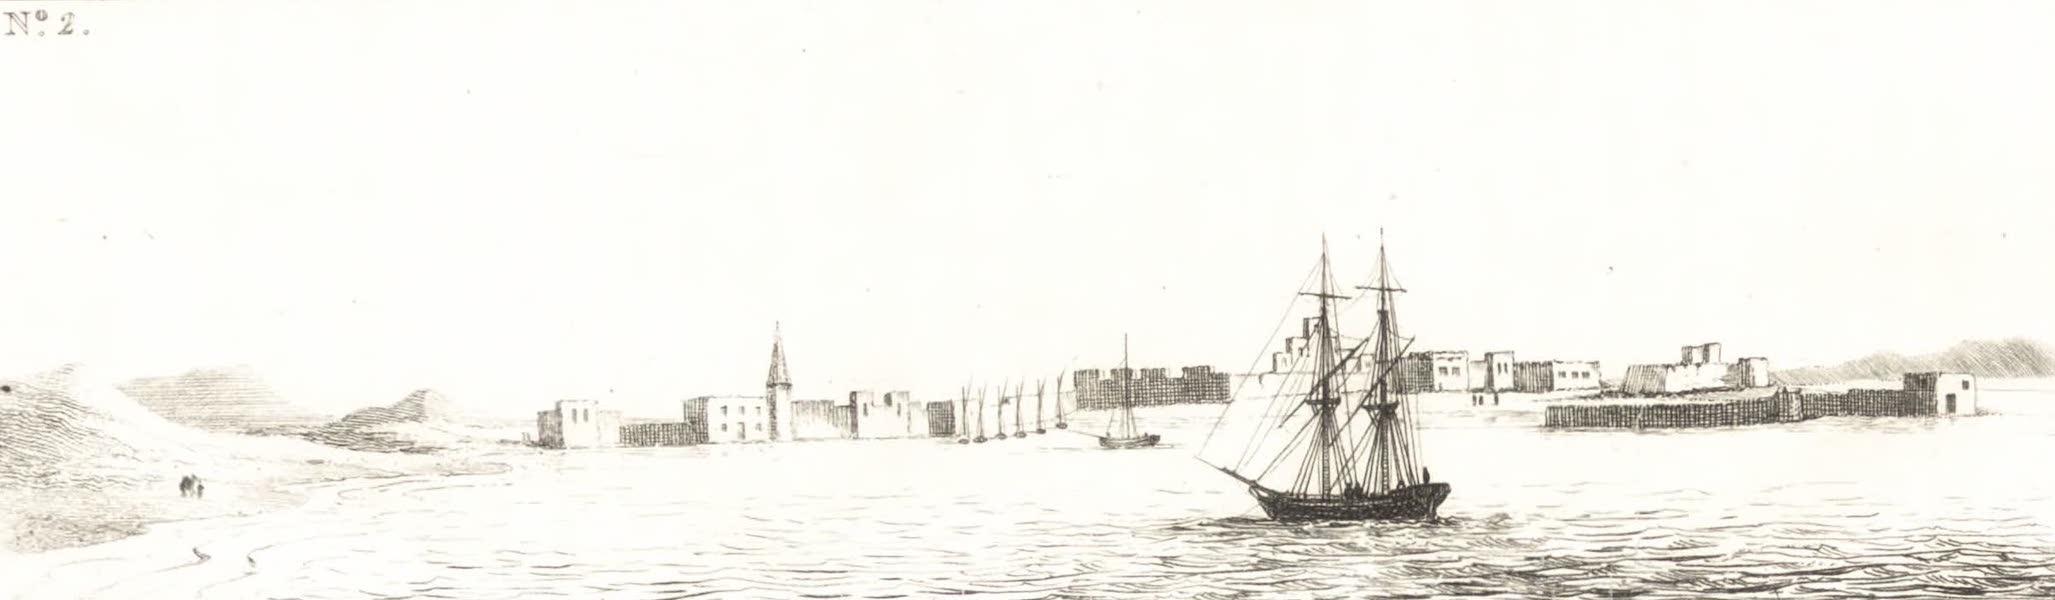 Journal of a Tour in the Levant Vol. 2 - Suez No. 2 (1820)